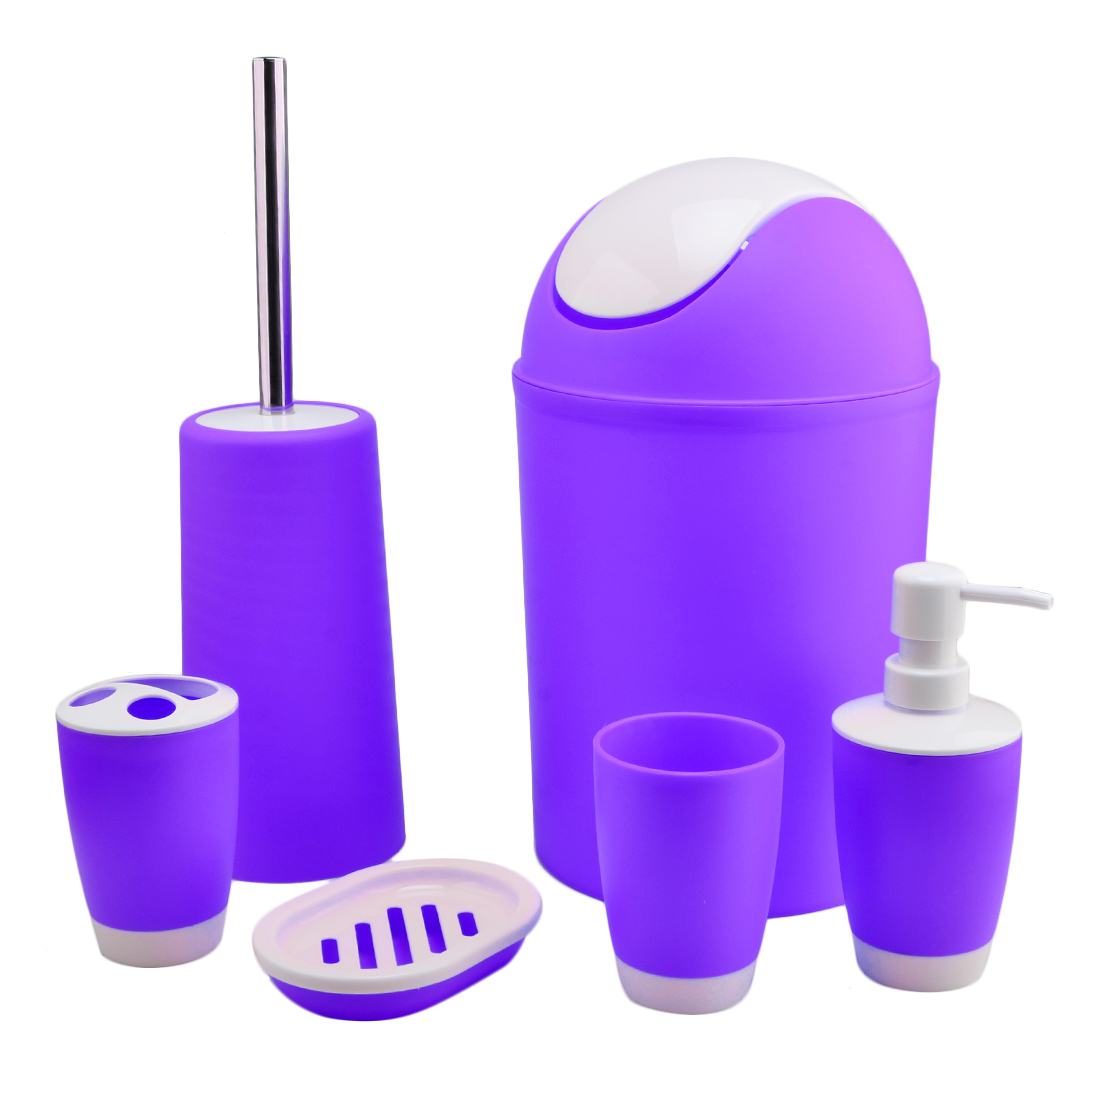 6 Piece Plastic Bath Accessory Bathroom Set Purple by